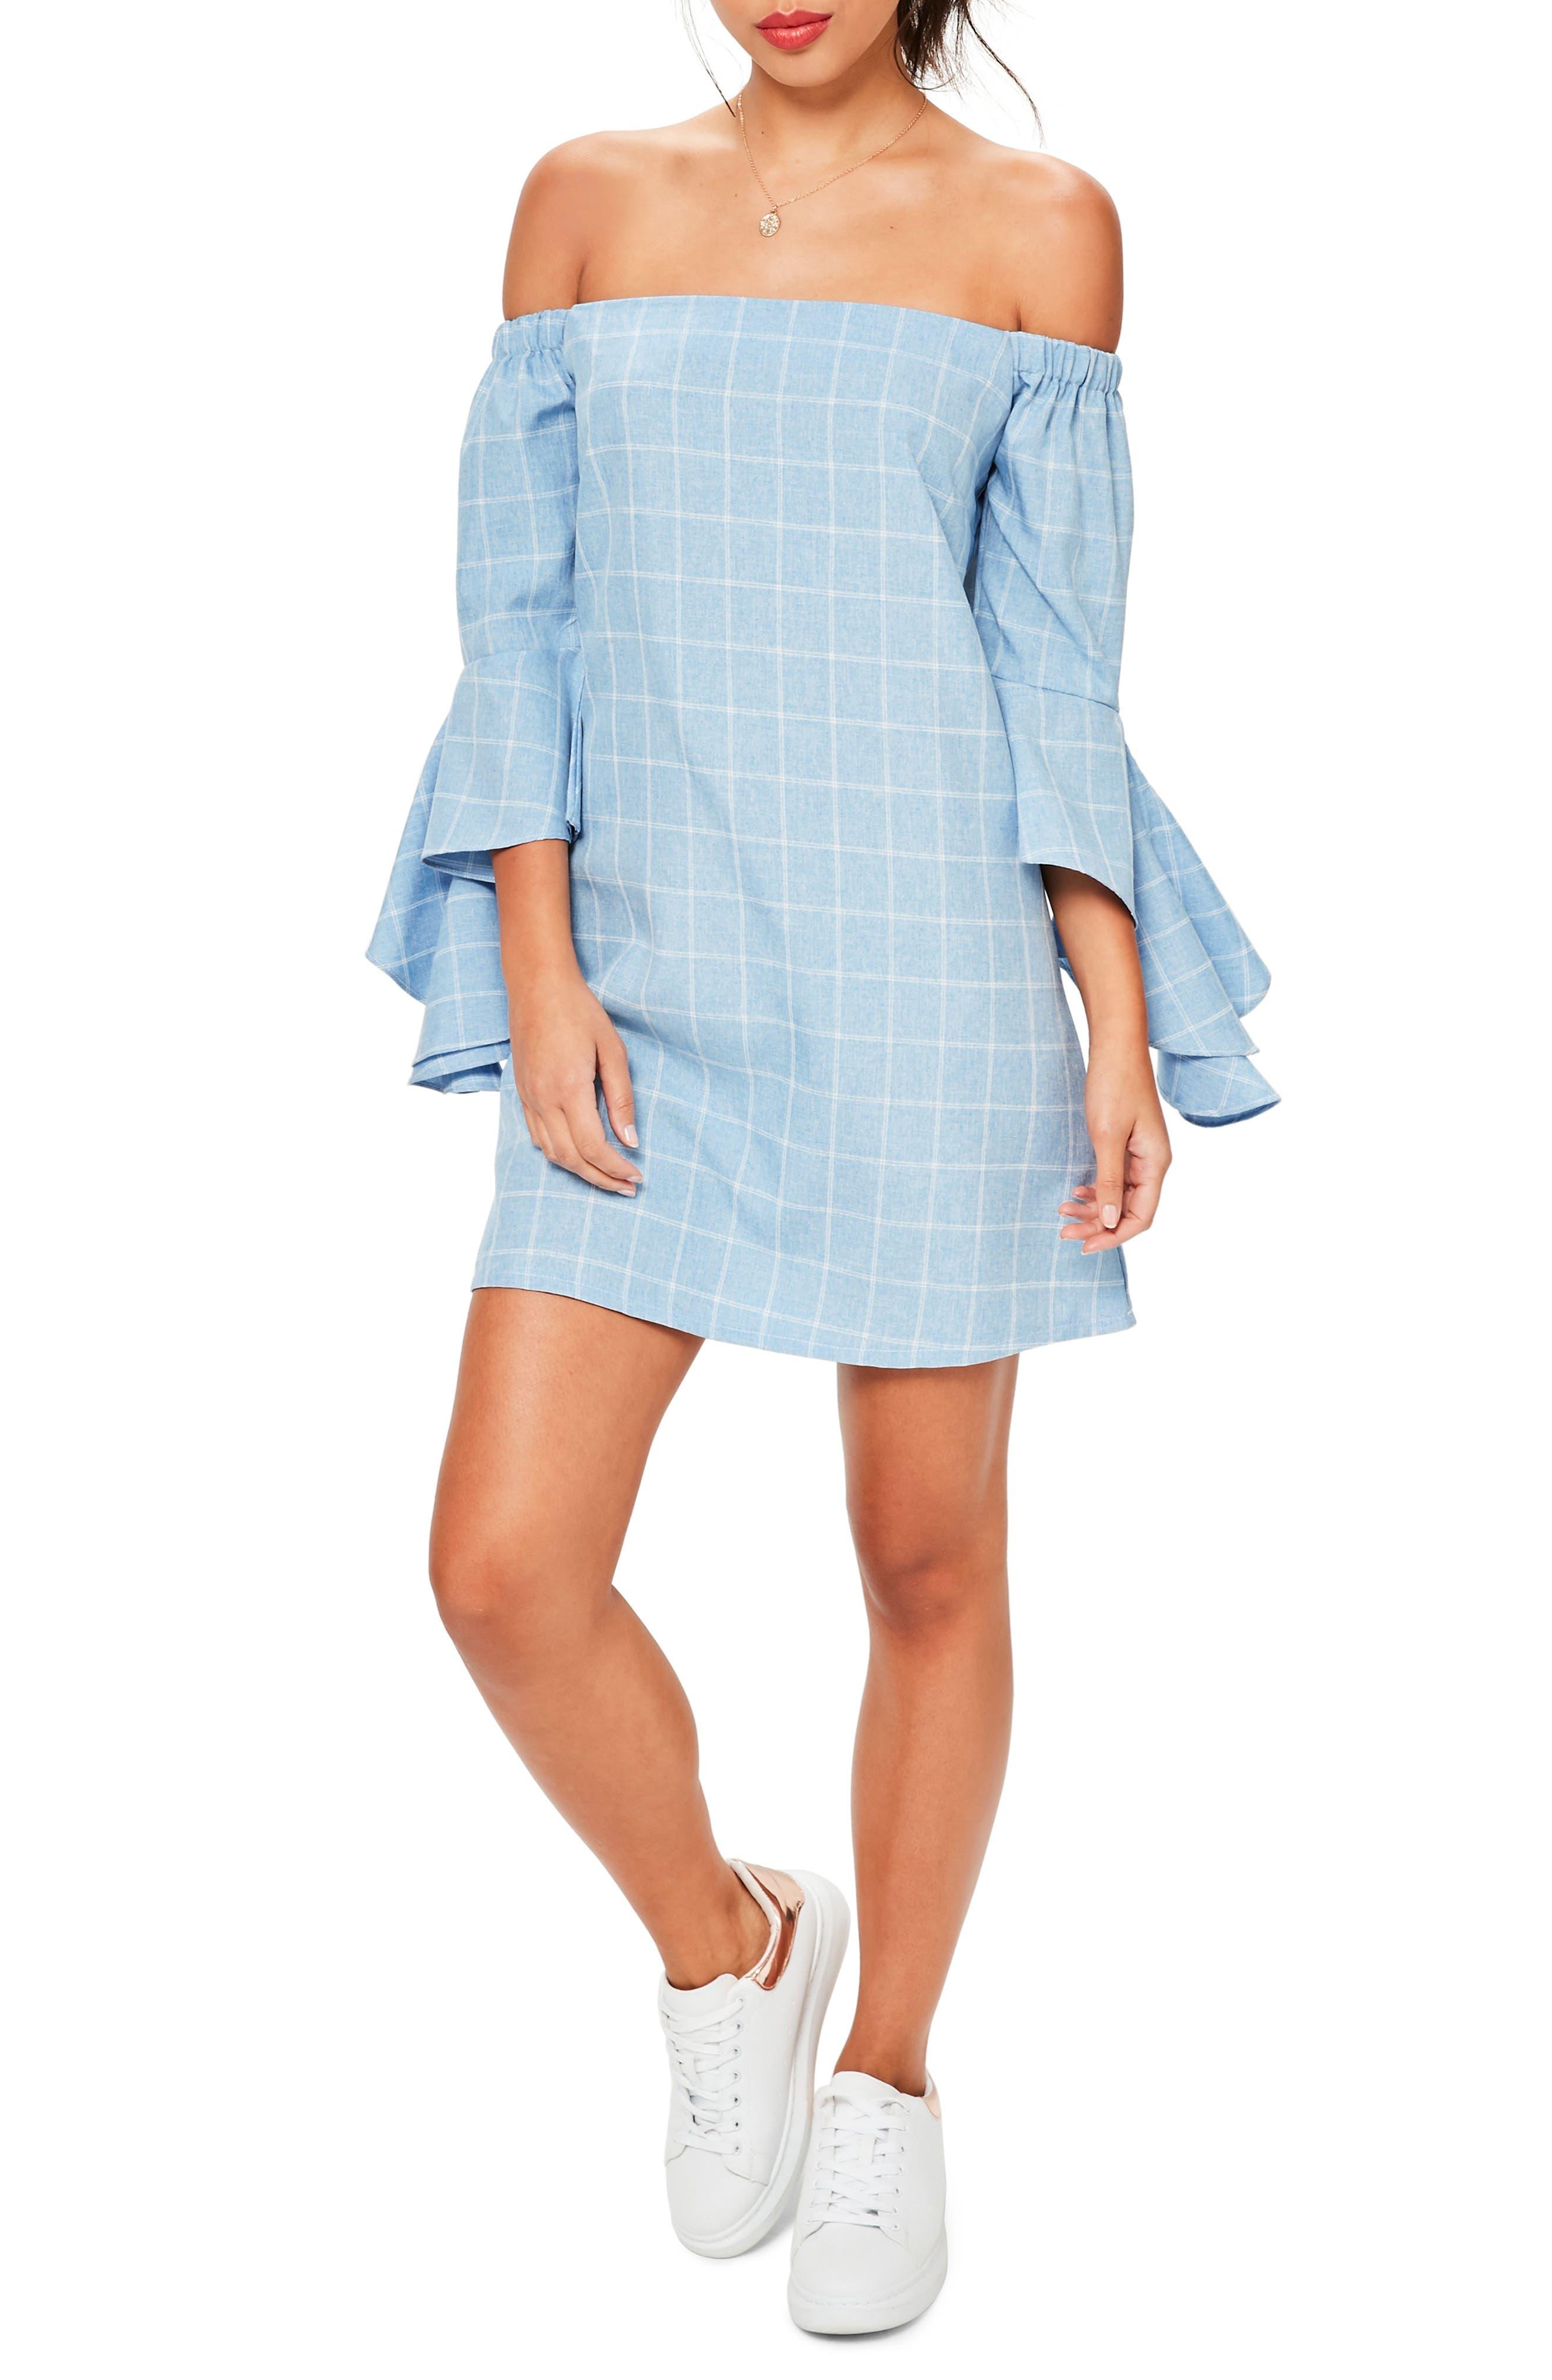 Bardot Ruffle Sleeve Off the Shoulder Shift Dress,                         Main,                         color, Blue